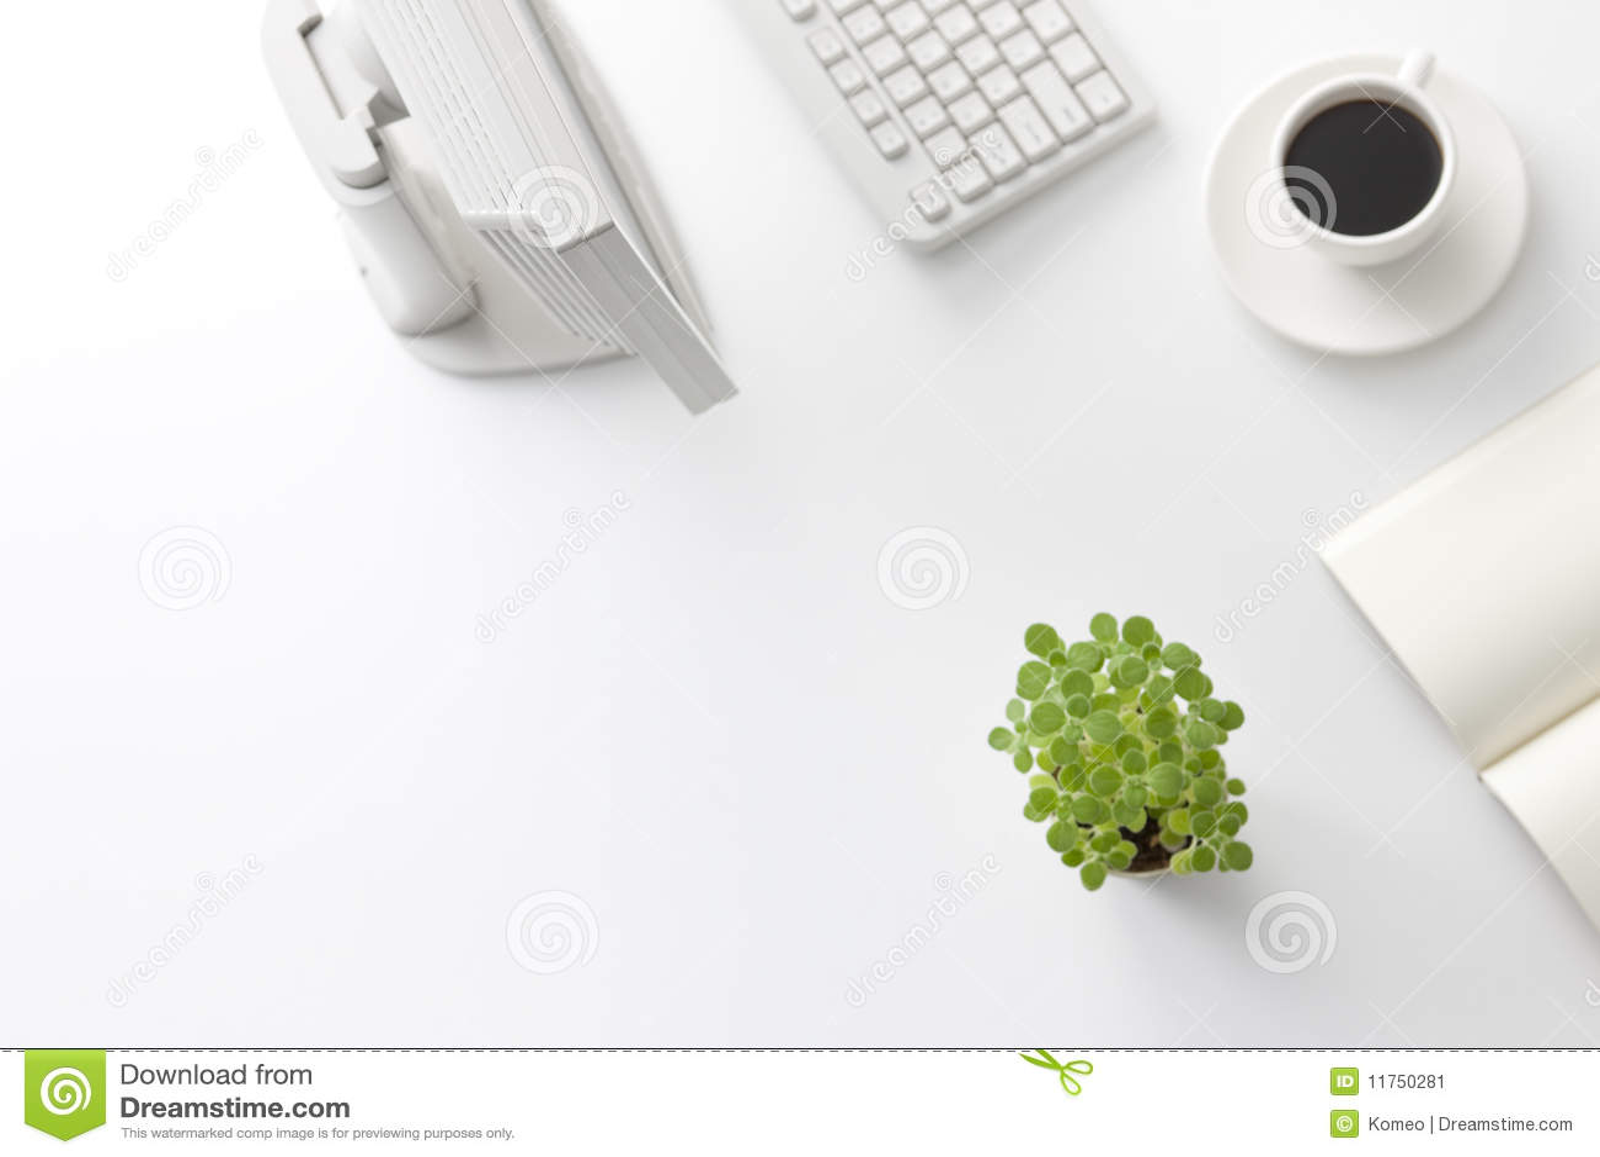 office desk stock image image 11750281